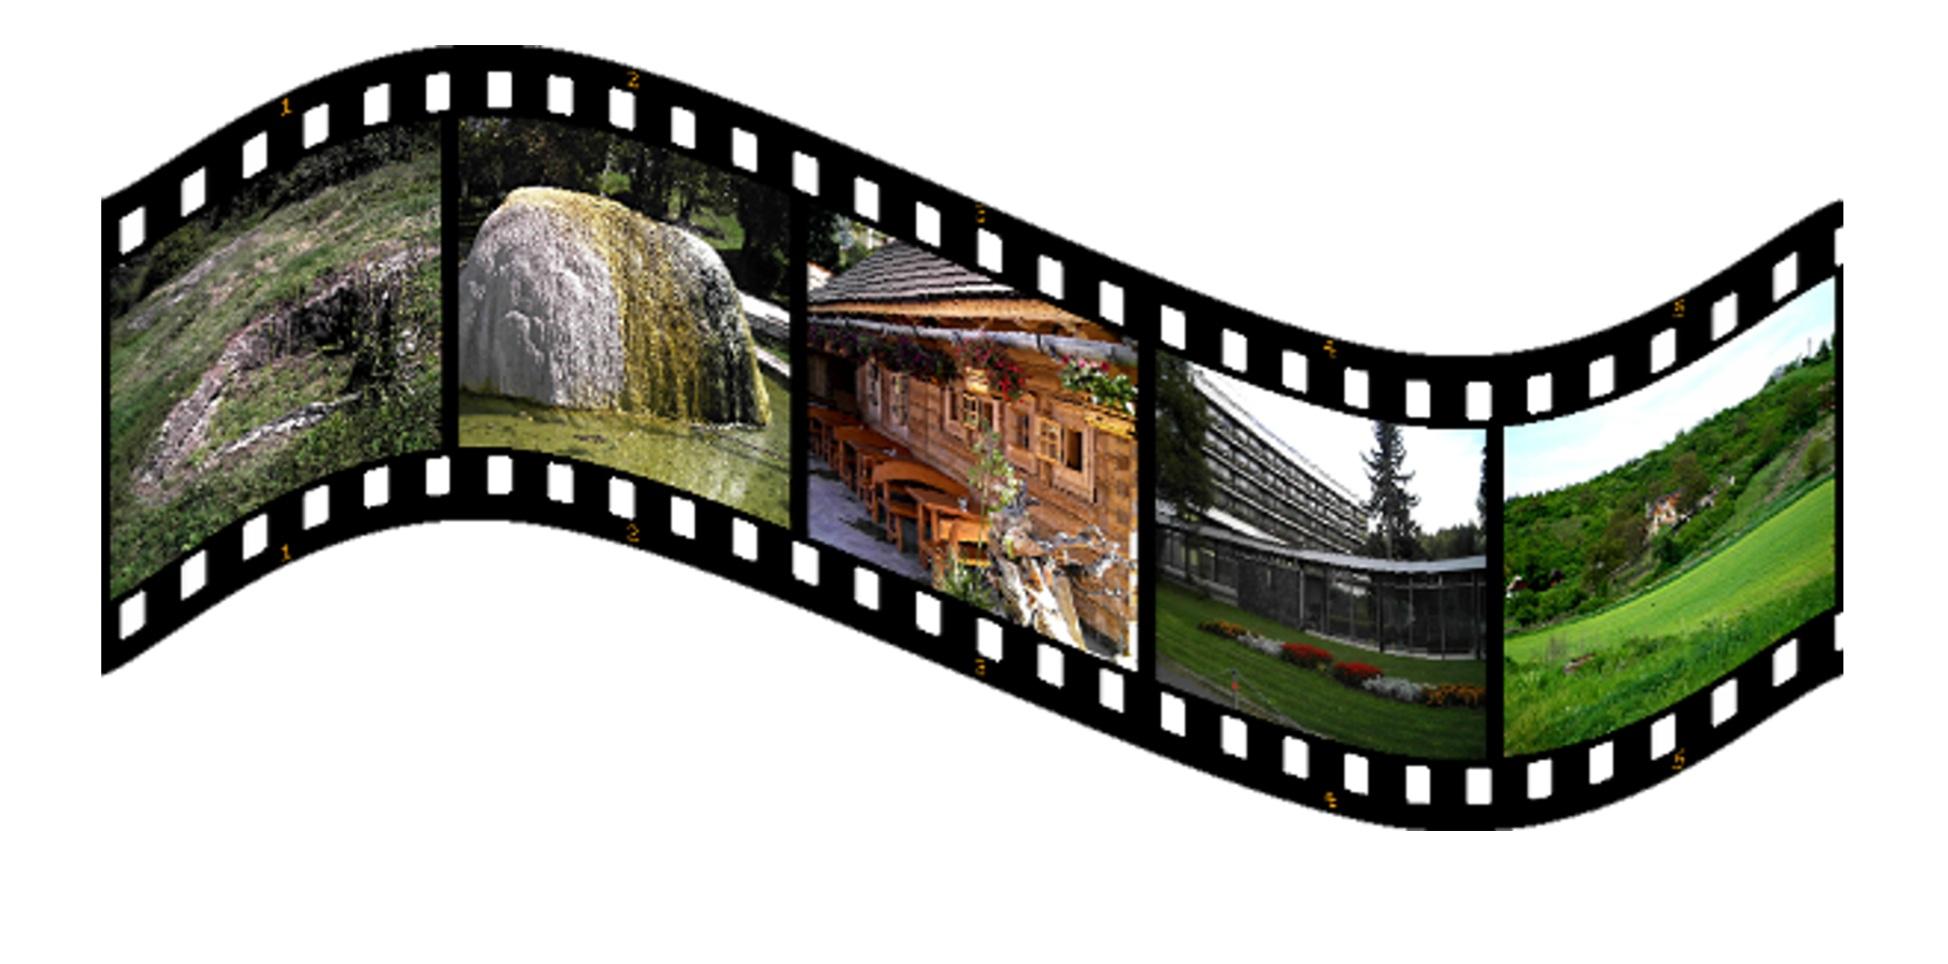 Gambar Film Spanduk Merek Produk Ilustrasi Gambar Kartun